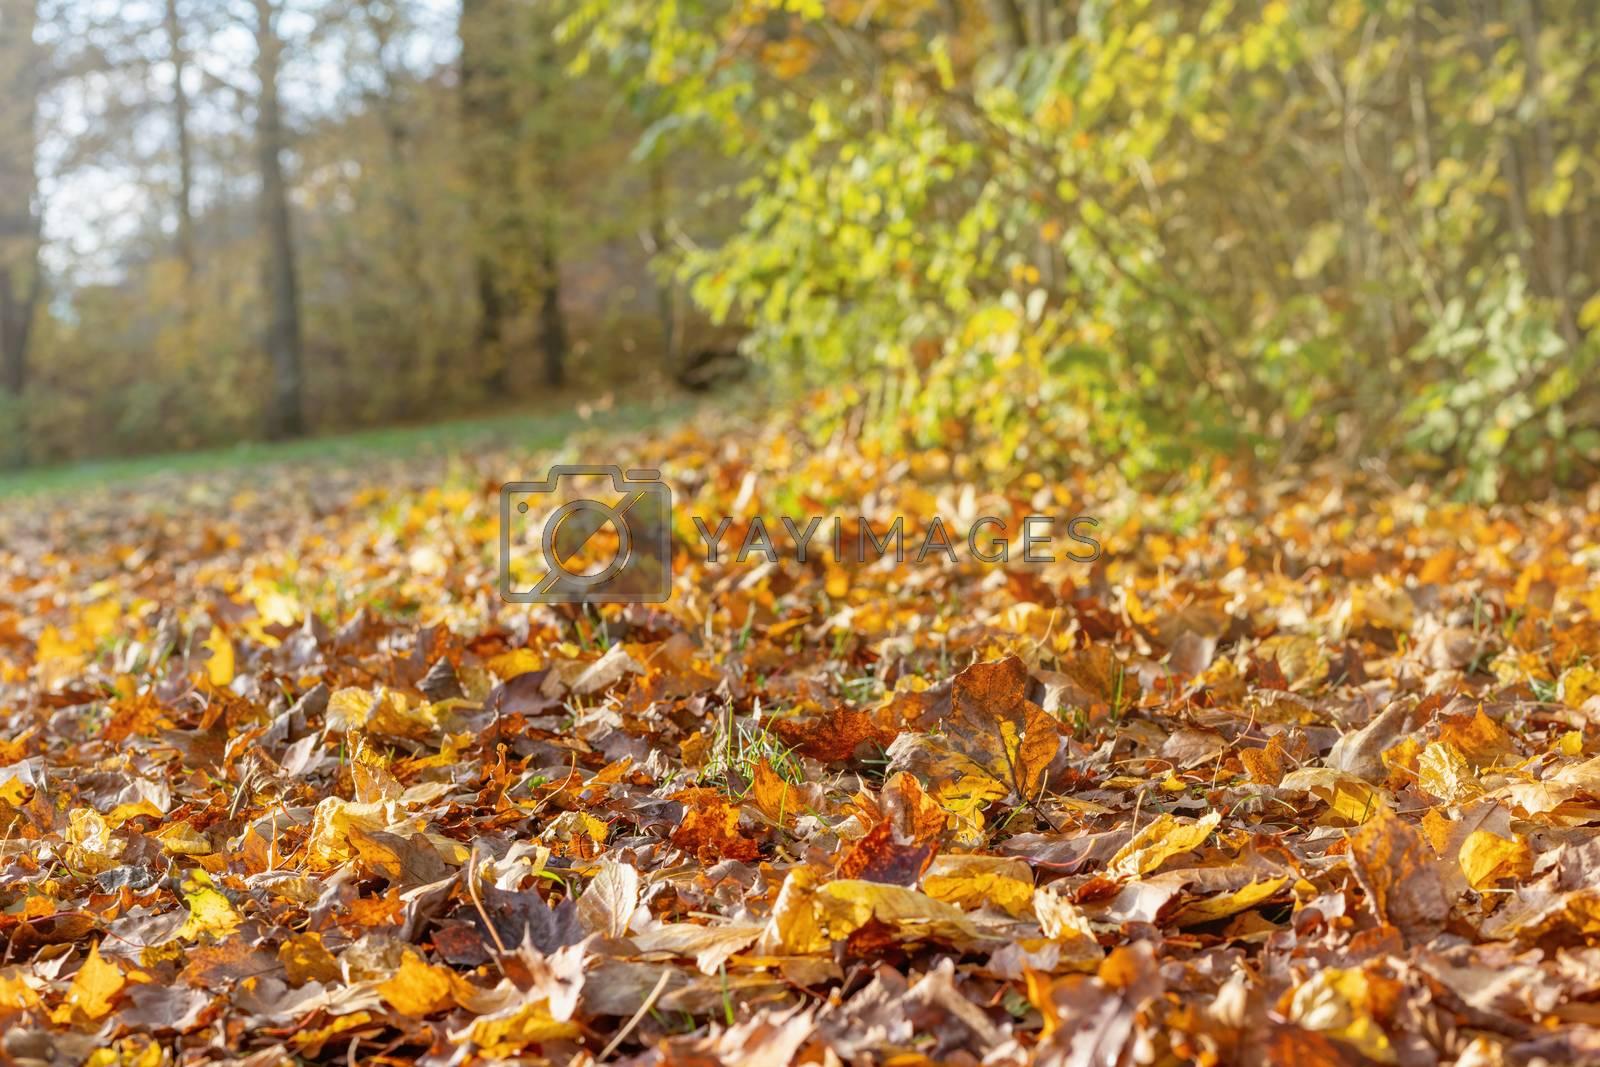 Autumn fallen leaves background in sunlight. Horizontally.